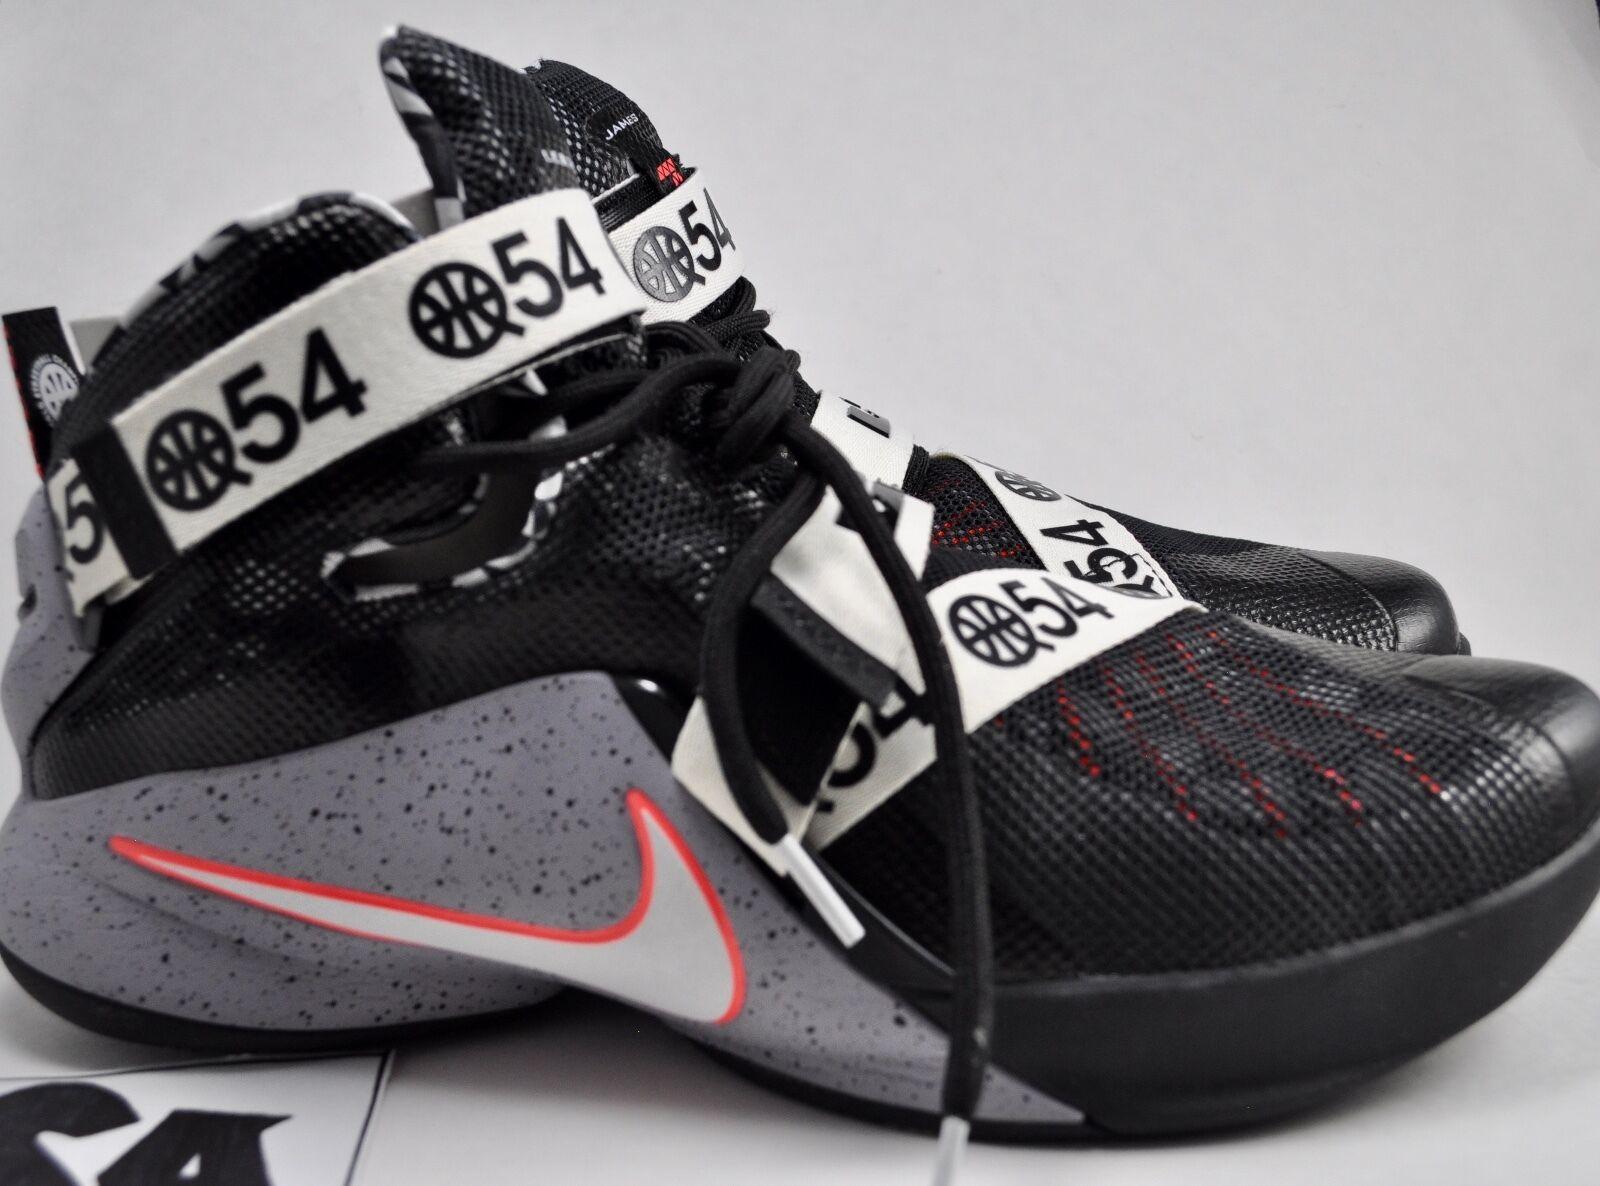 9918be65a0b9 ... Quai54 Nike Lebron Lebron Lebron Soldier IX LMTD Q54 810803 015 Size 11  7db57b ...